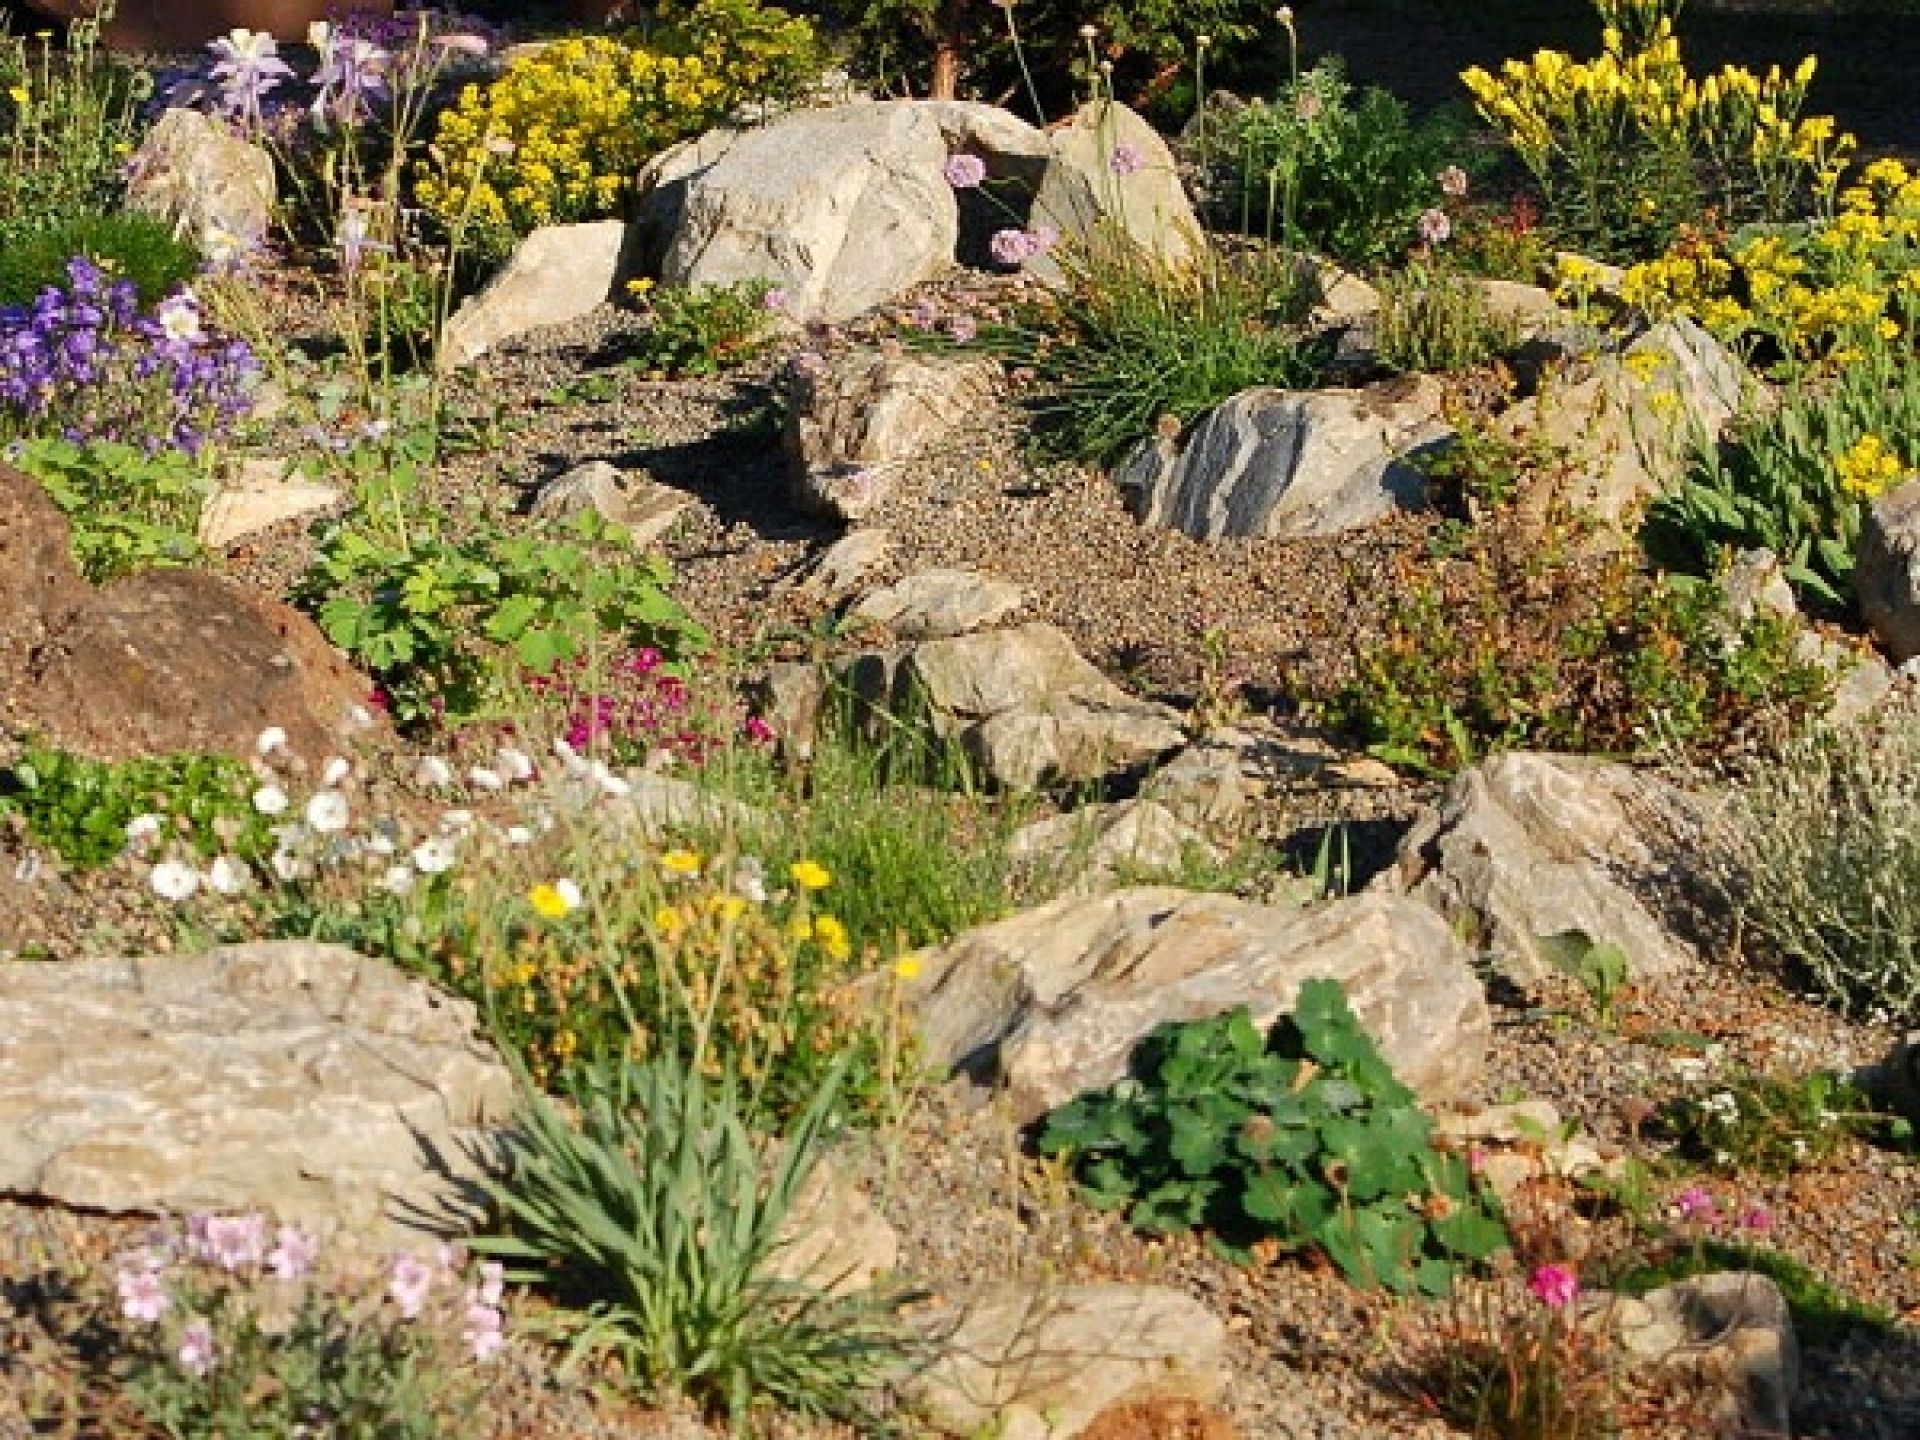 1920x1440 Wild Ginger Farm Rock Garden Front Yard Jpg 1920 1440